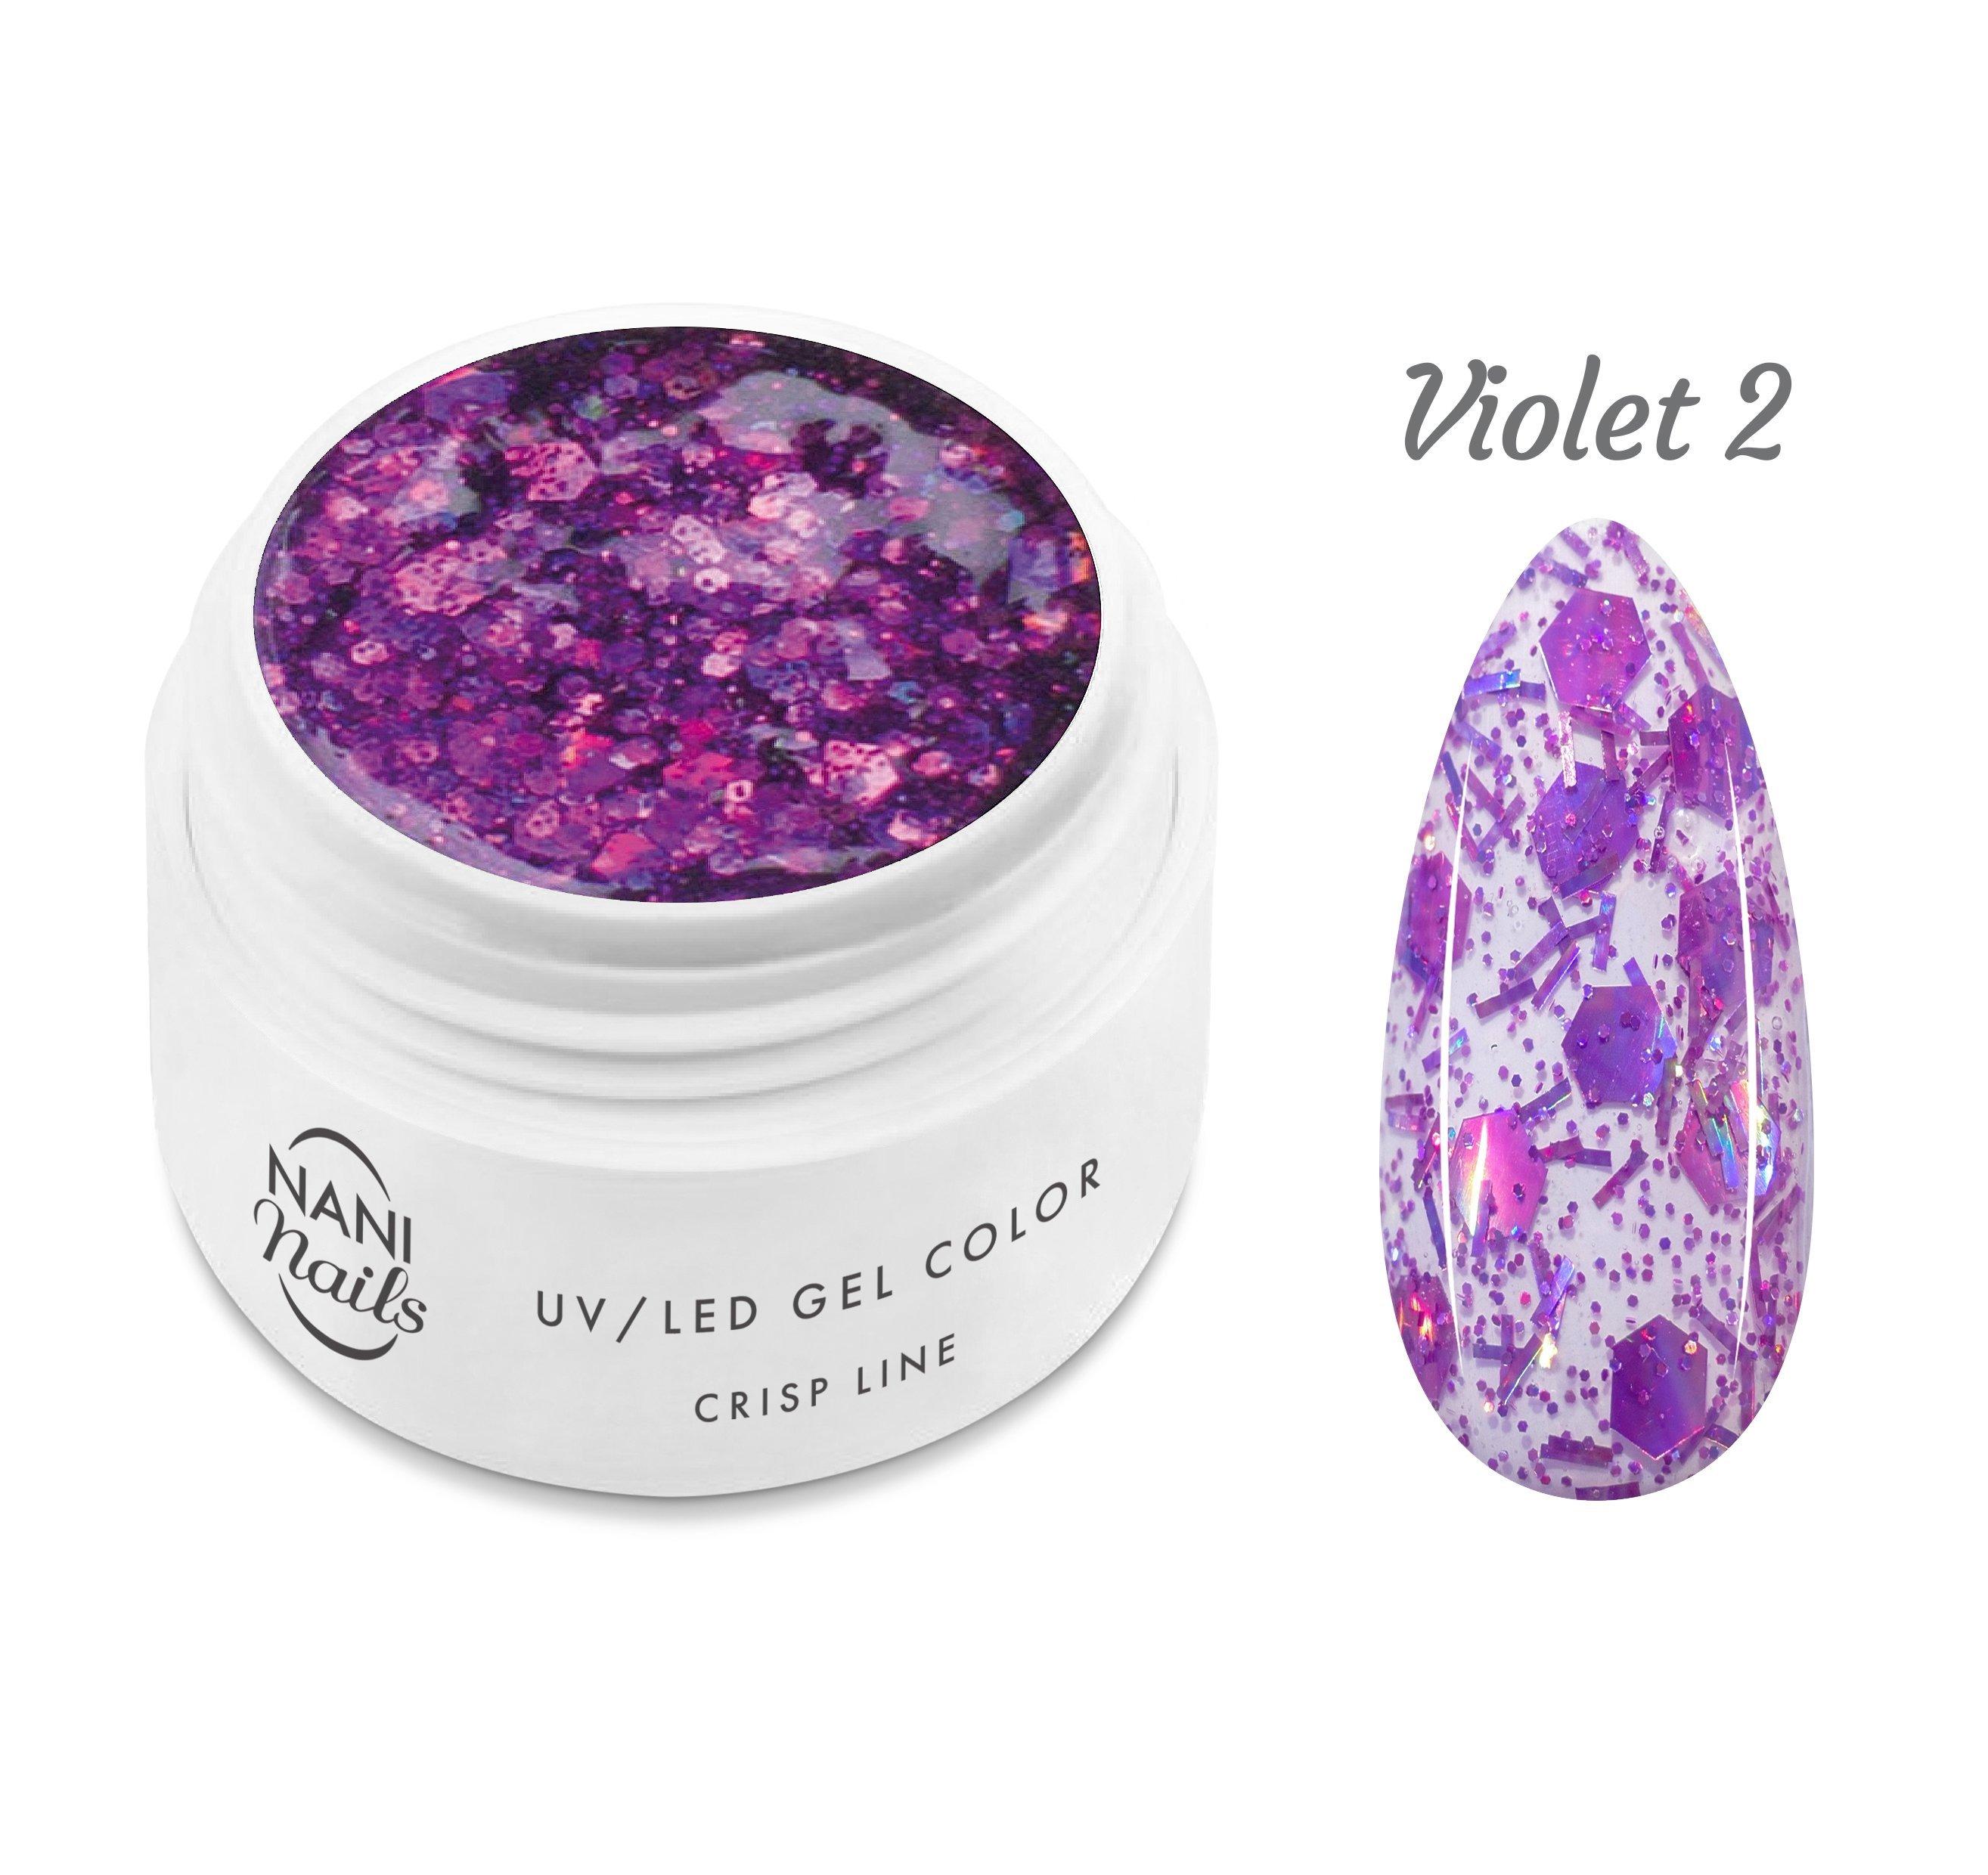 NANI UV gél Crisp Line 5 ml - Violet